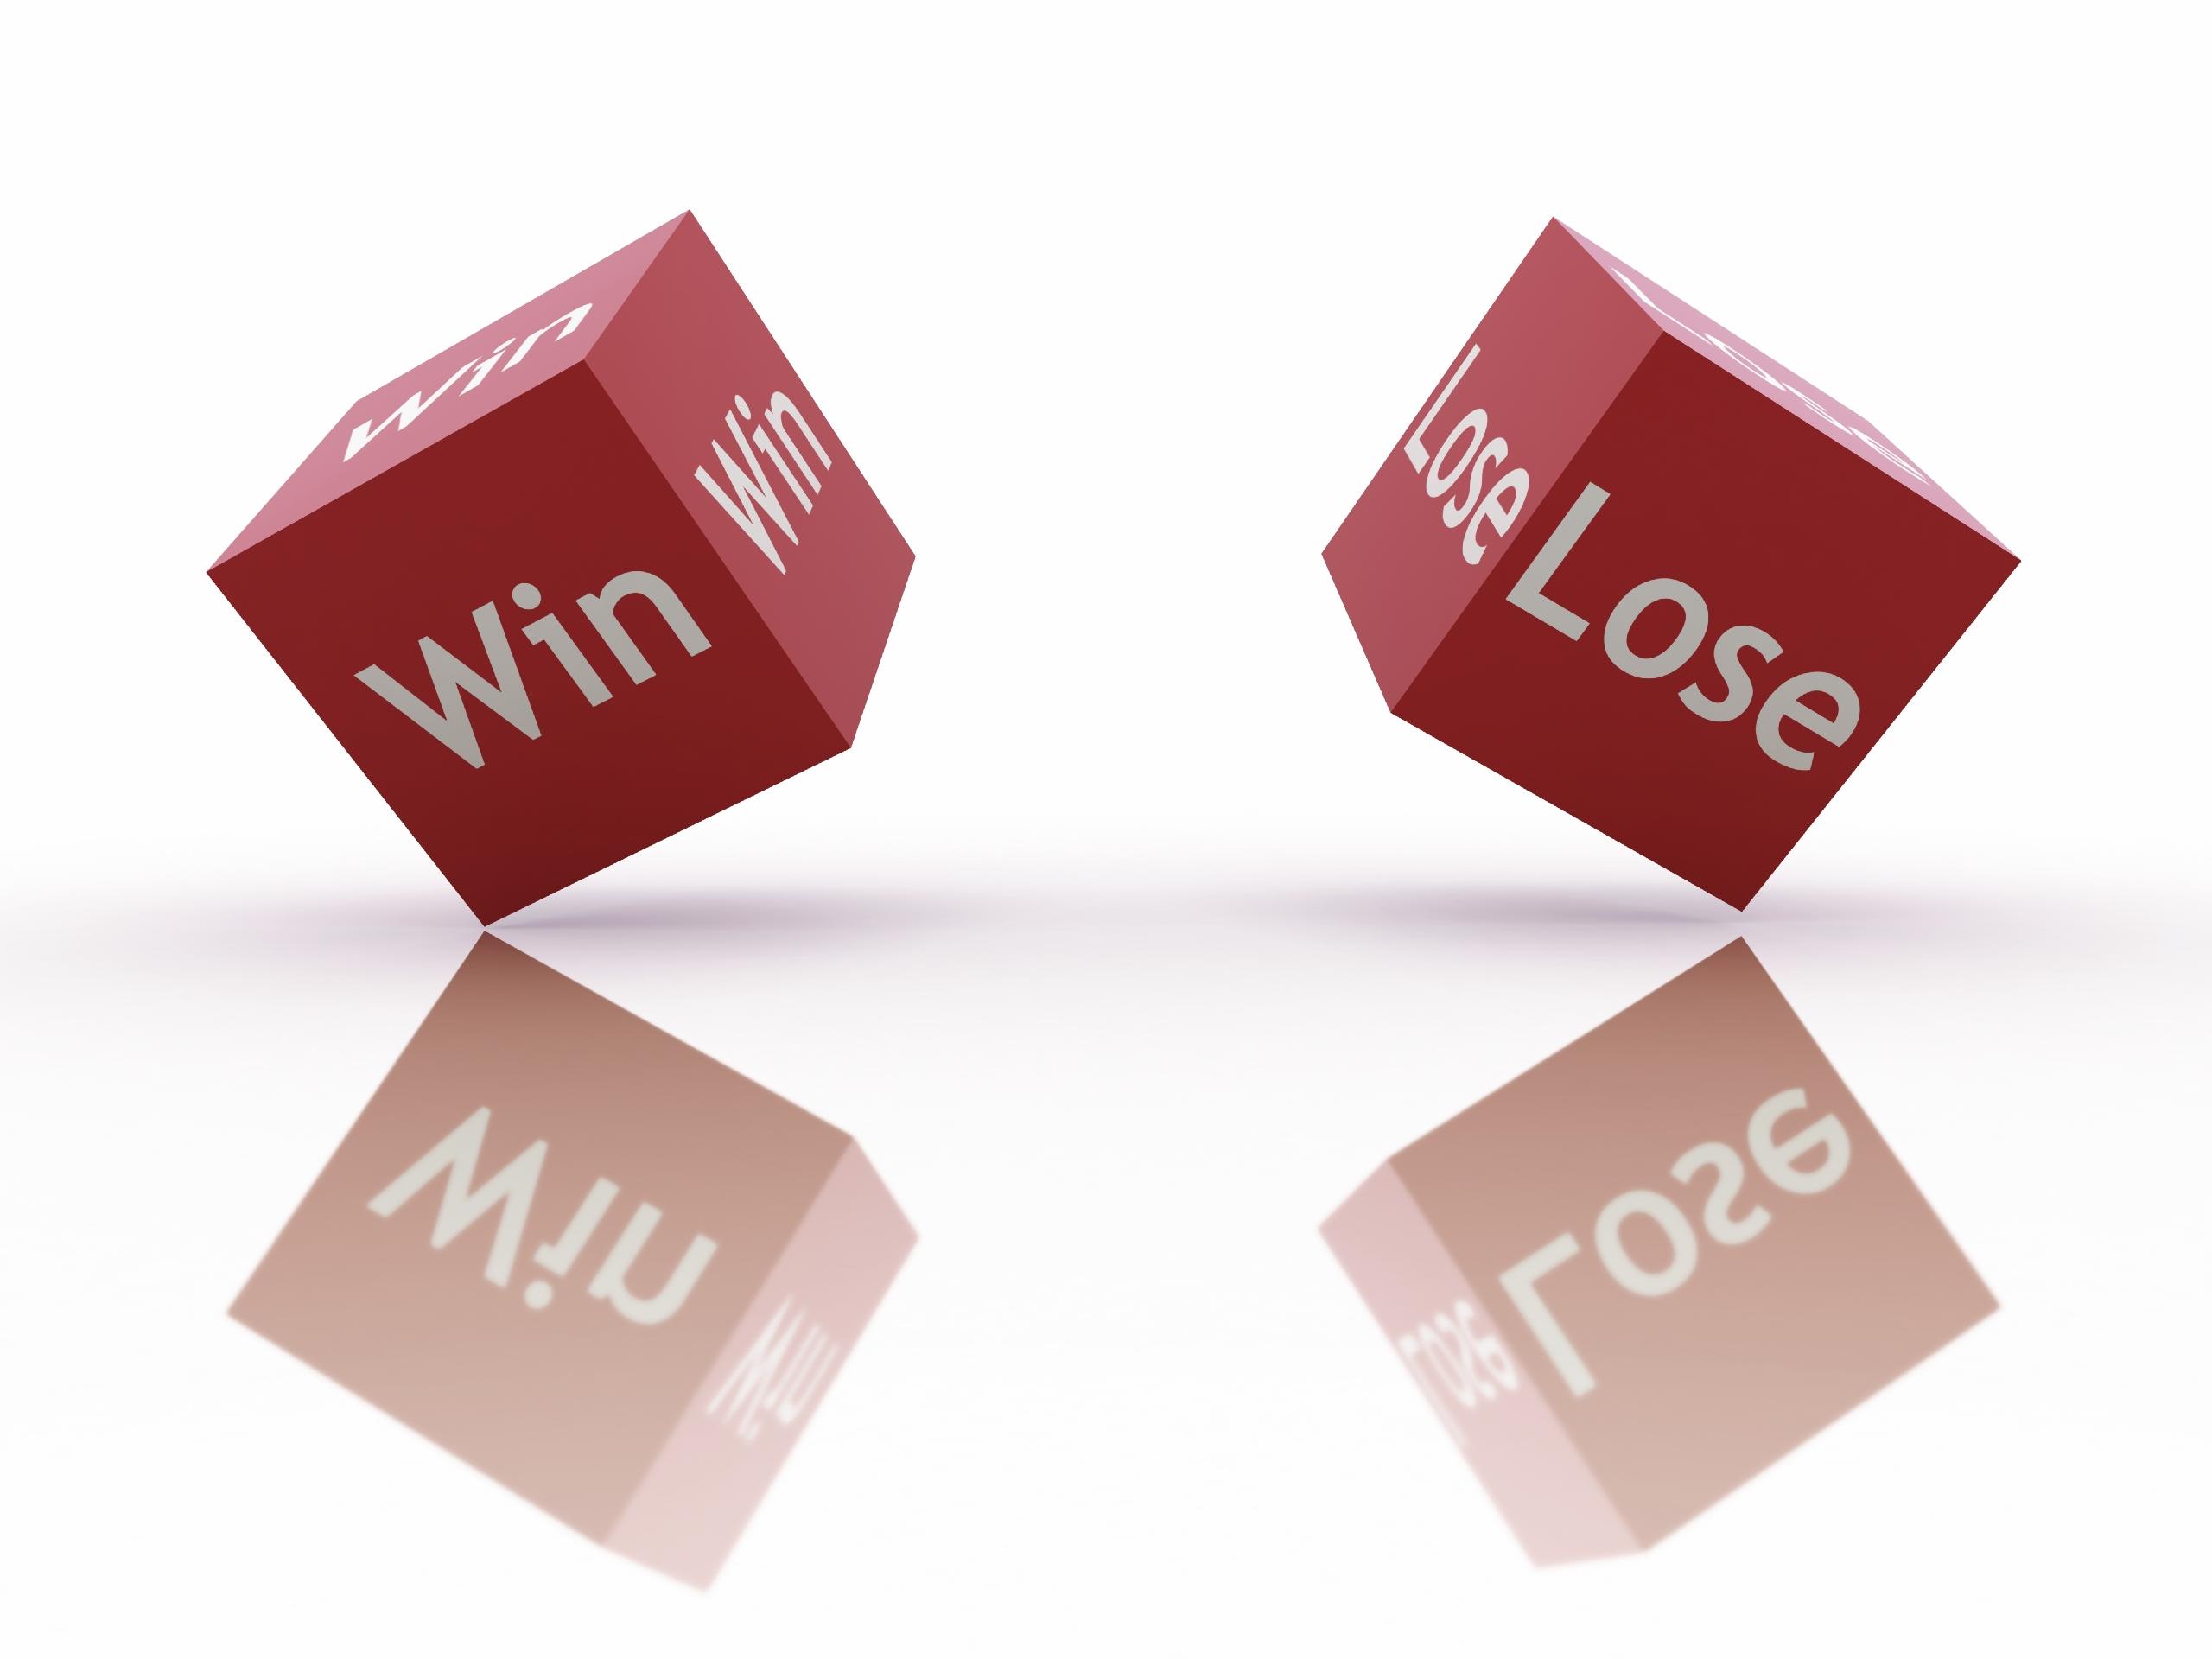 Losing Really Sucks Doesn't It?